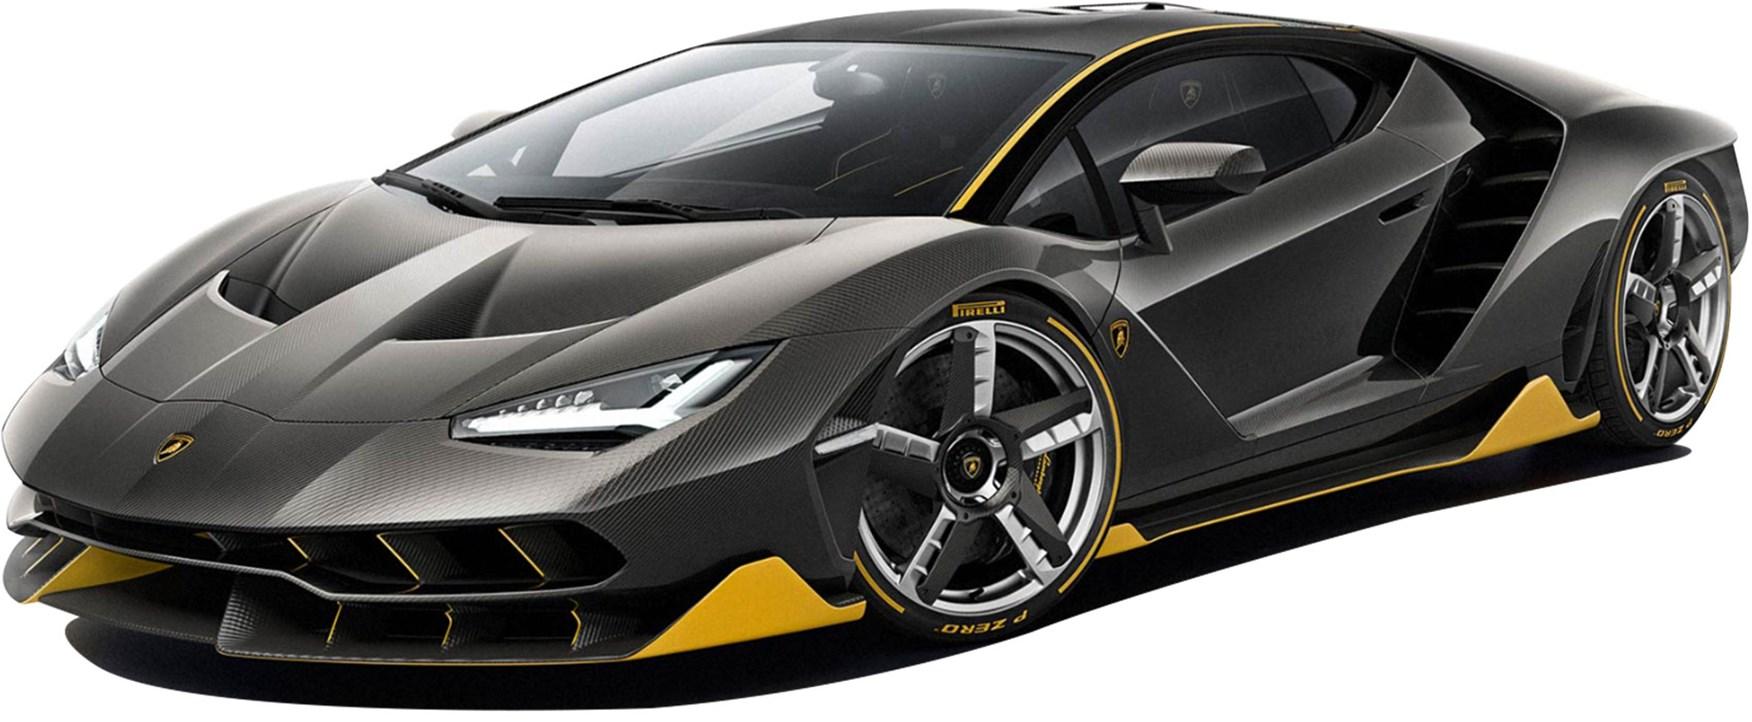 Winkelmann S Parting Gift The Lamborghini Centenario Car April